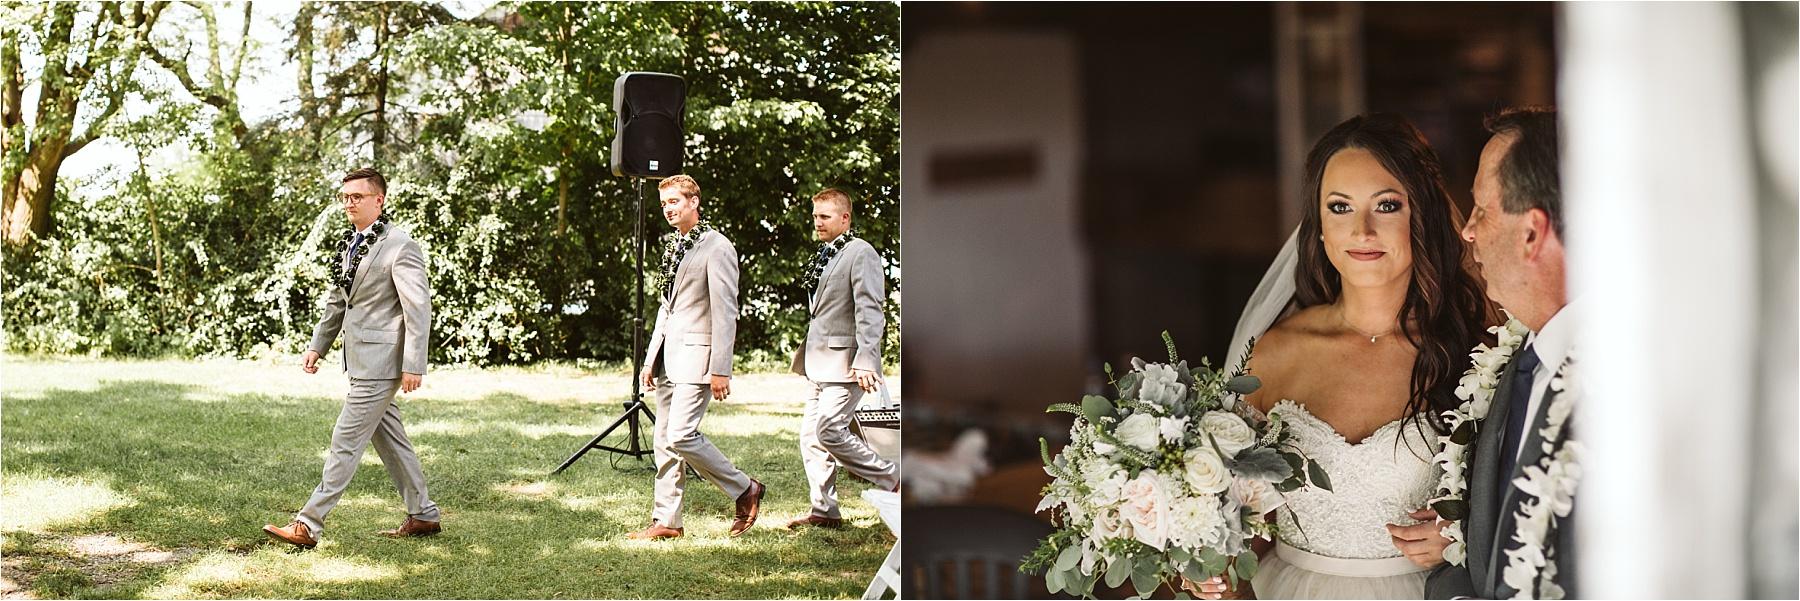 Hidden Vineyard Michigan Wedding_0095.jpg